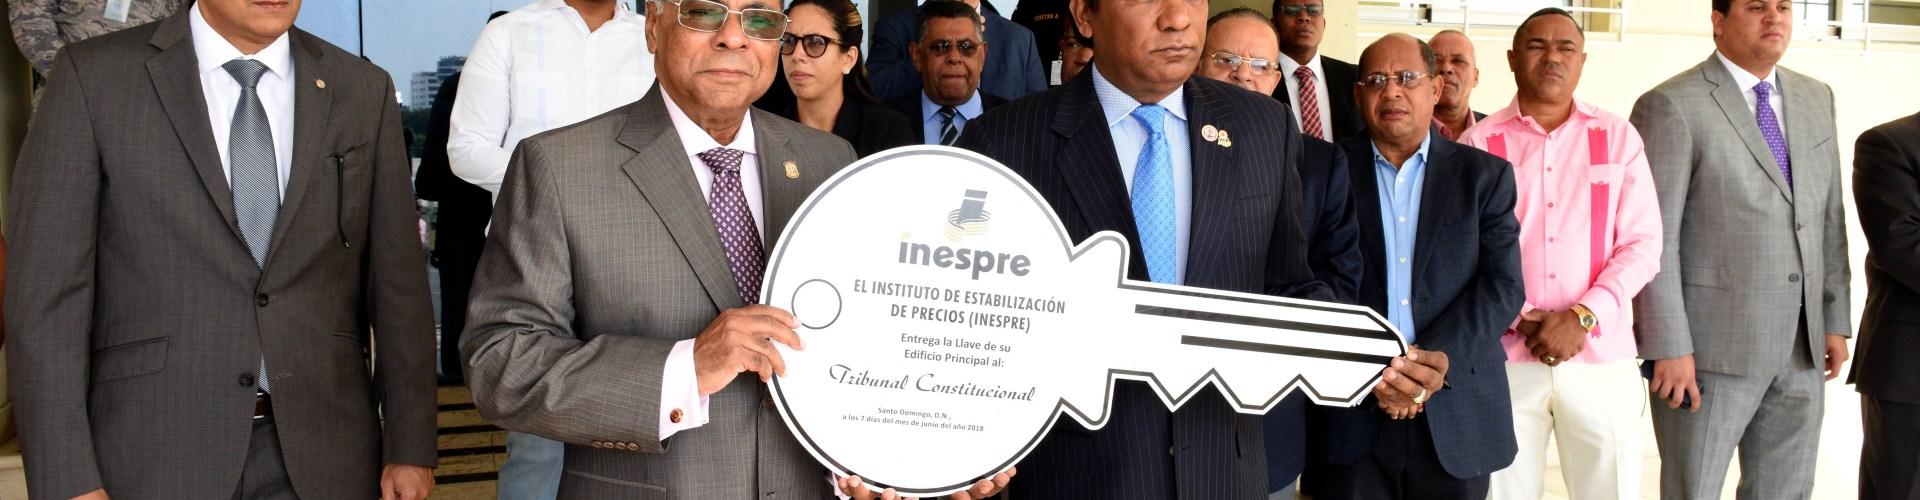 Tribunal Constitucional recibe llave edificio